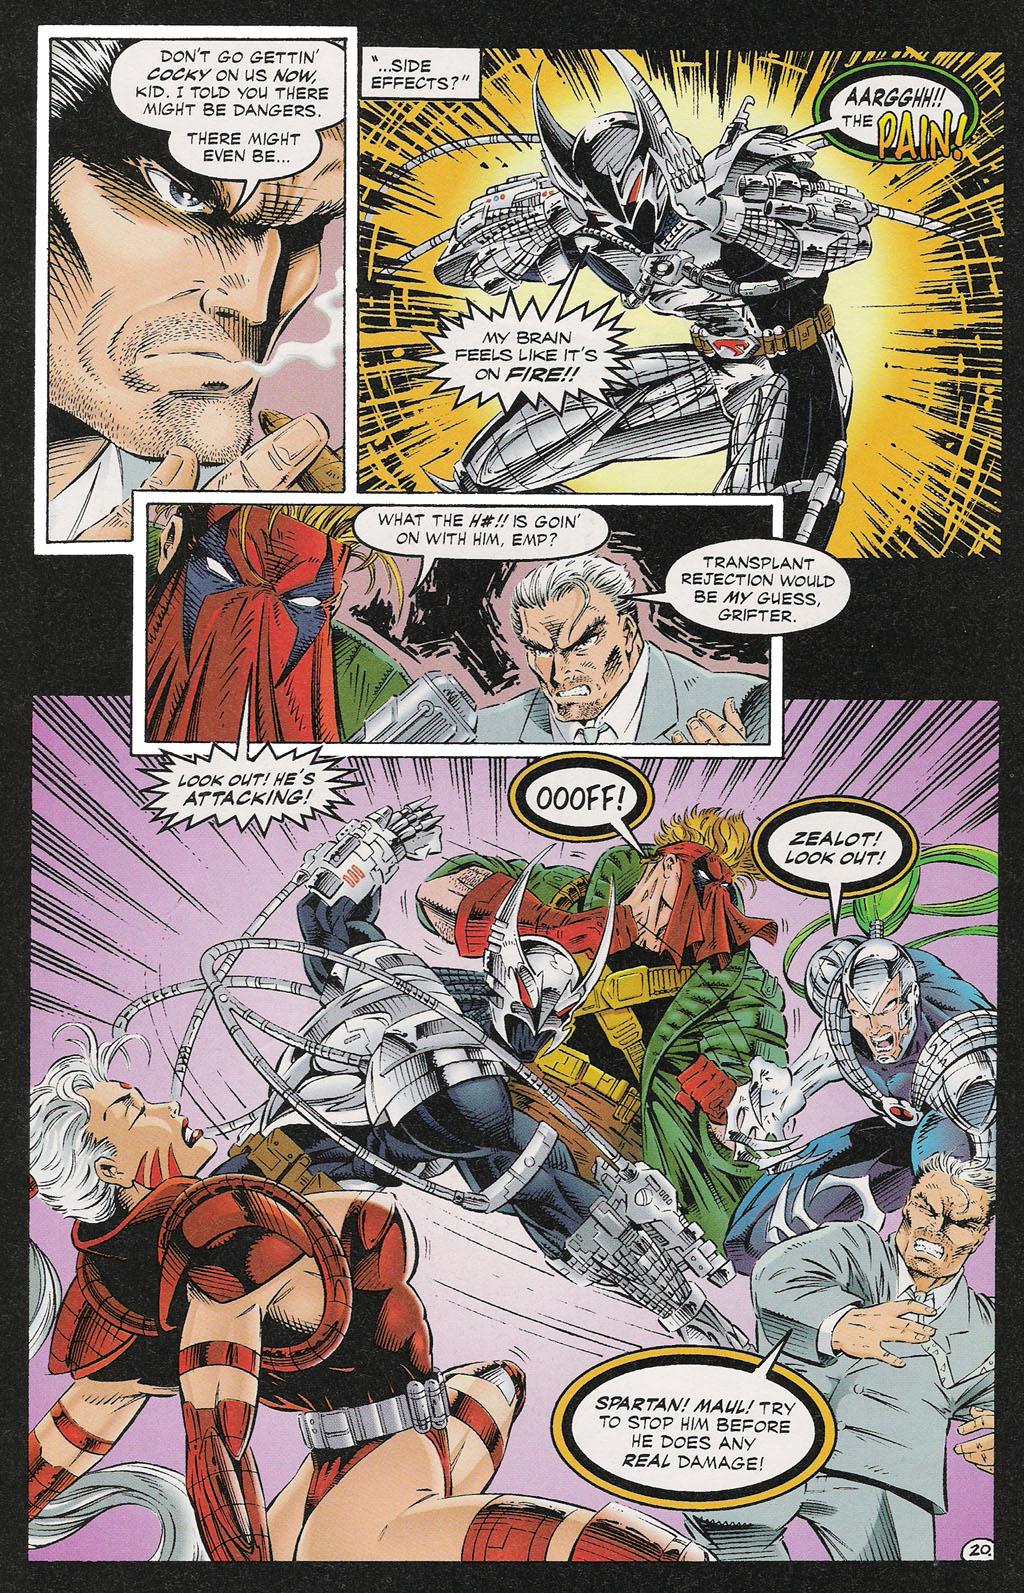 Read online ShadowHawk comic -  Issue #13 - 17